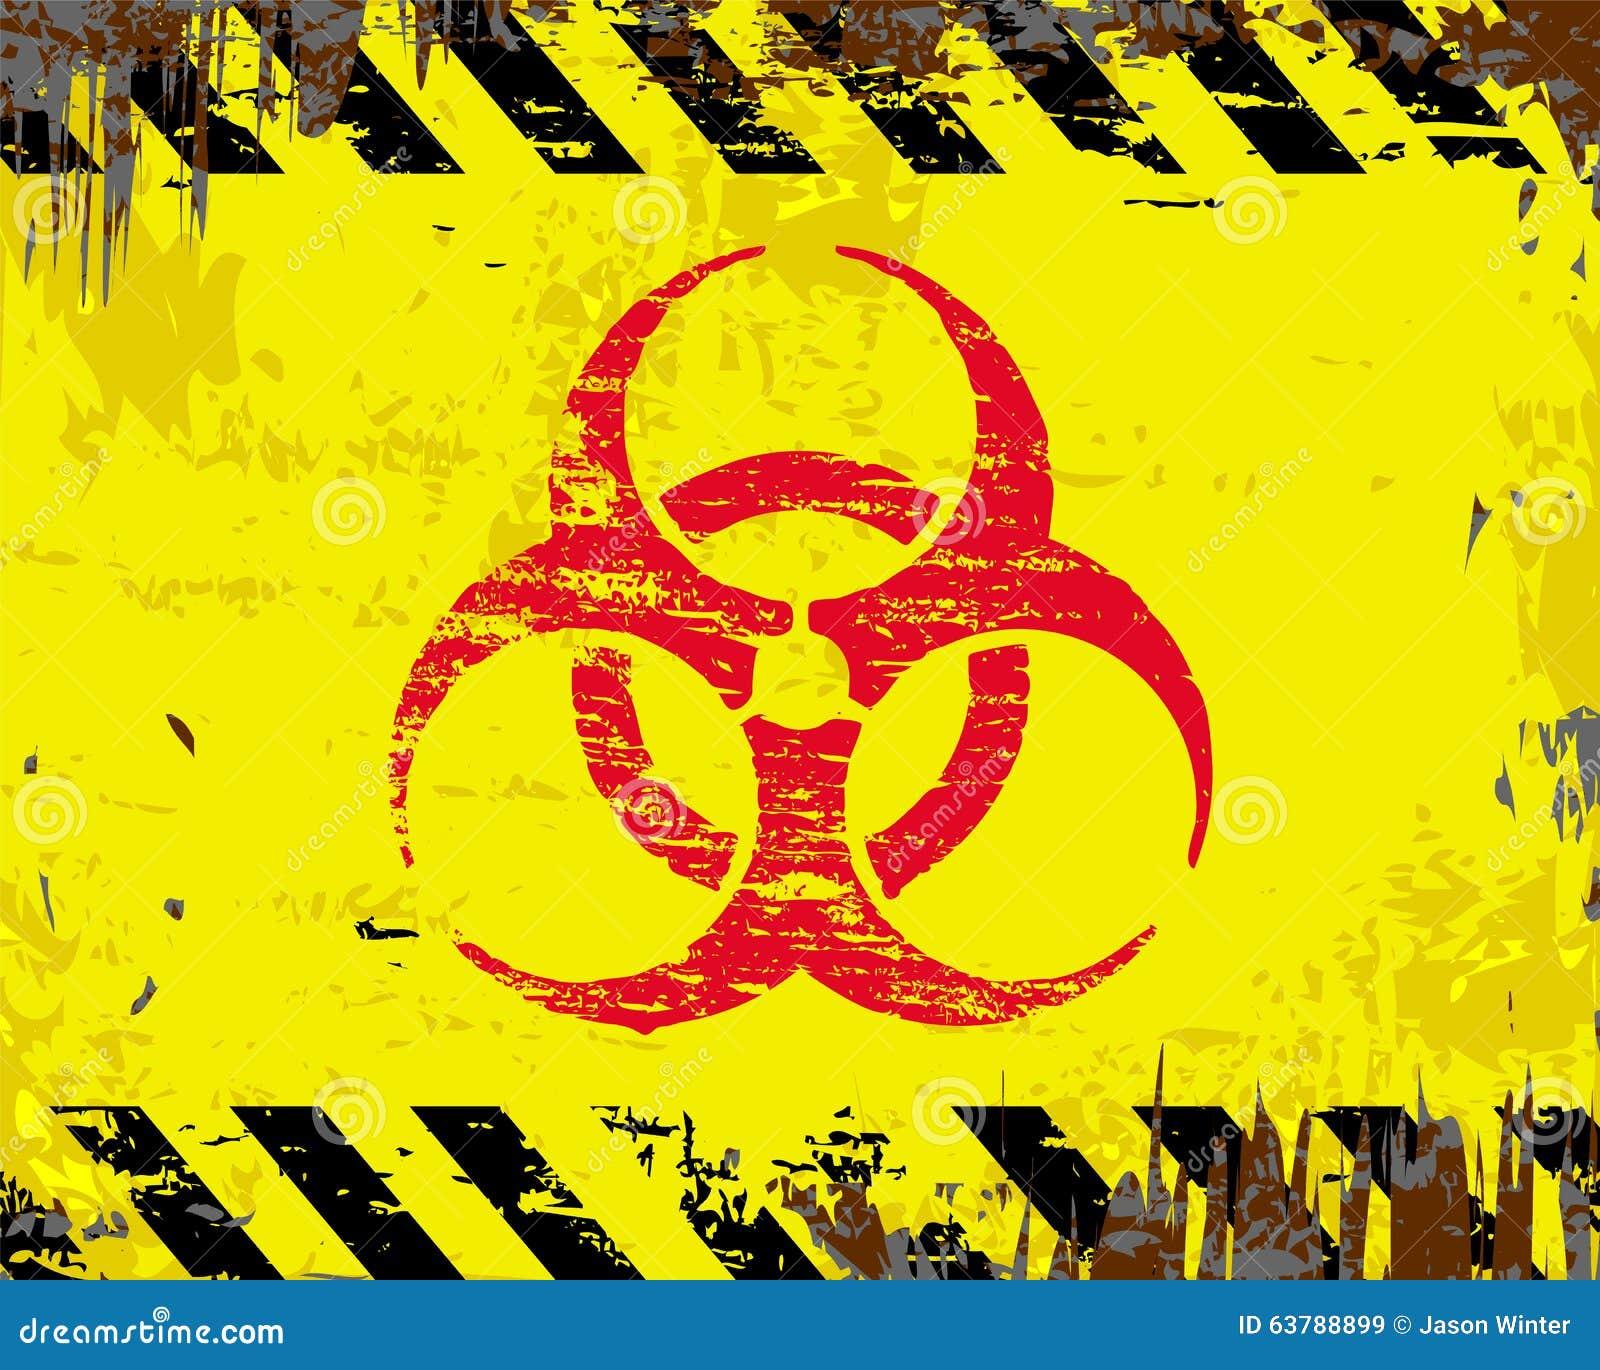 Biohazard Symbol Sign Stock Vector Illustration Of Access 63788899